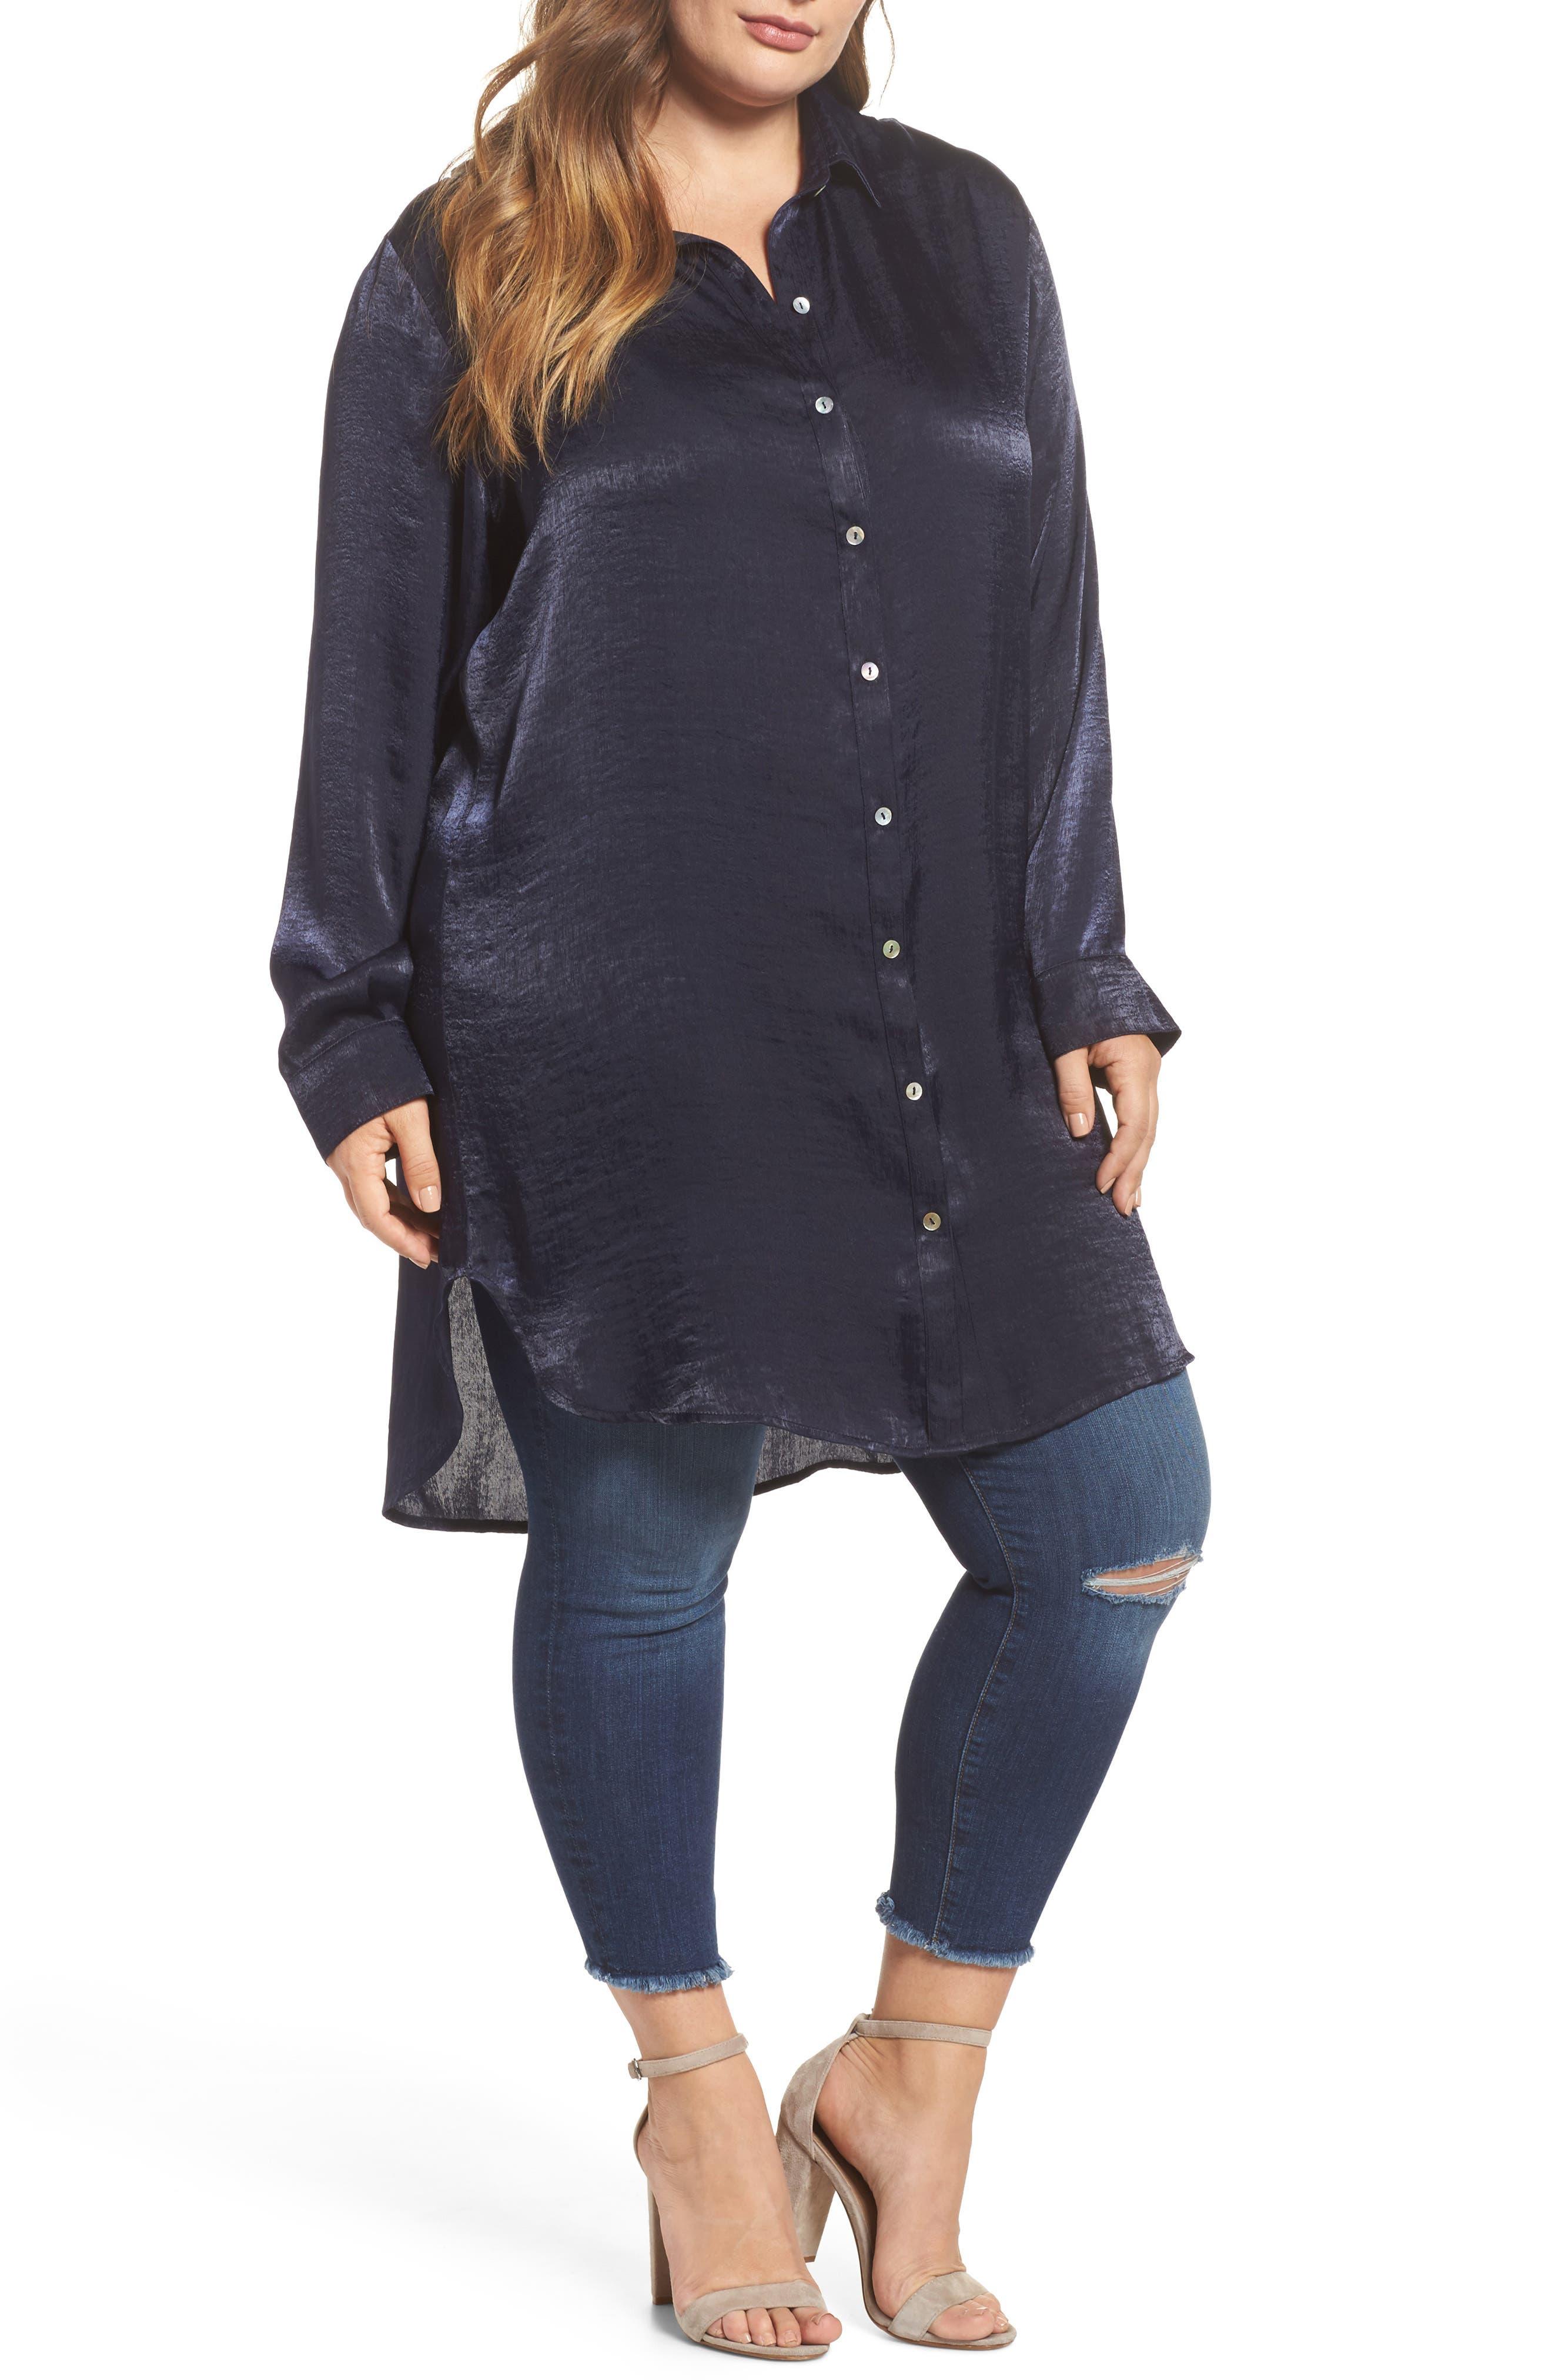 Alternate Image 1 Selected - SLINK Jeans Hammered Satin Tunic Shirt (Plus Size)